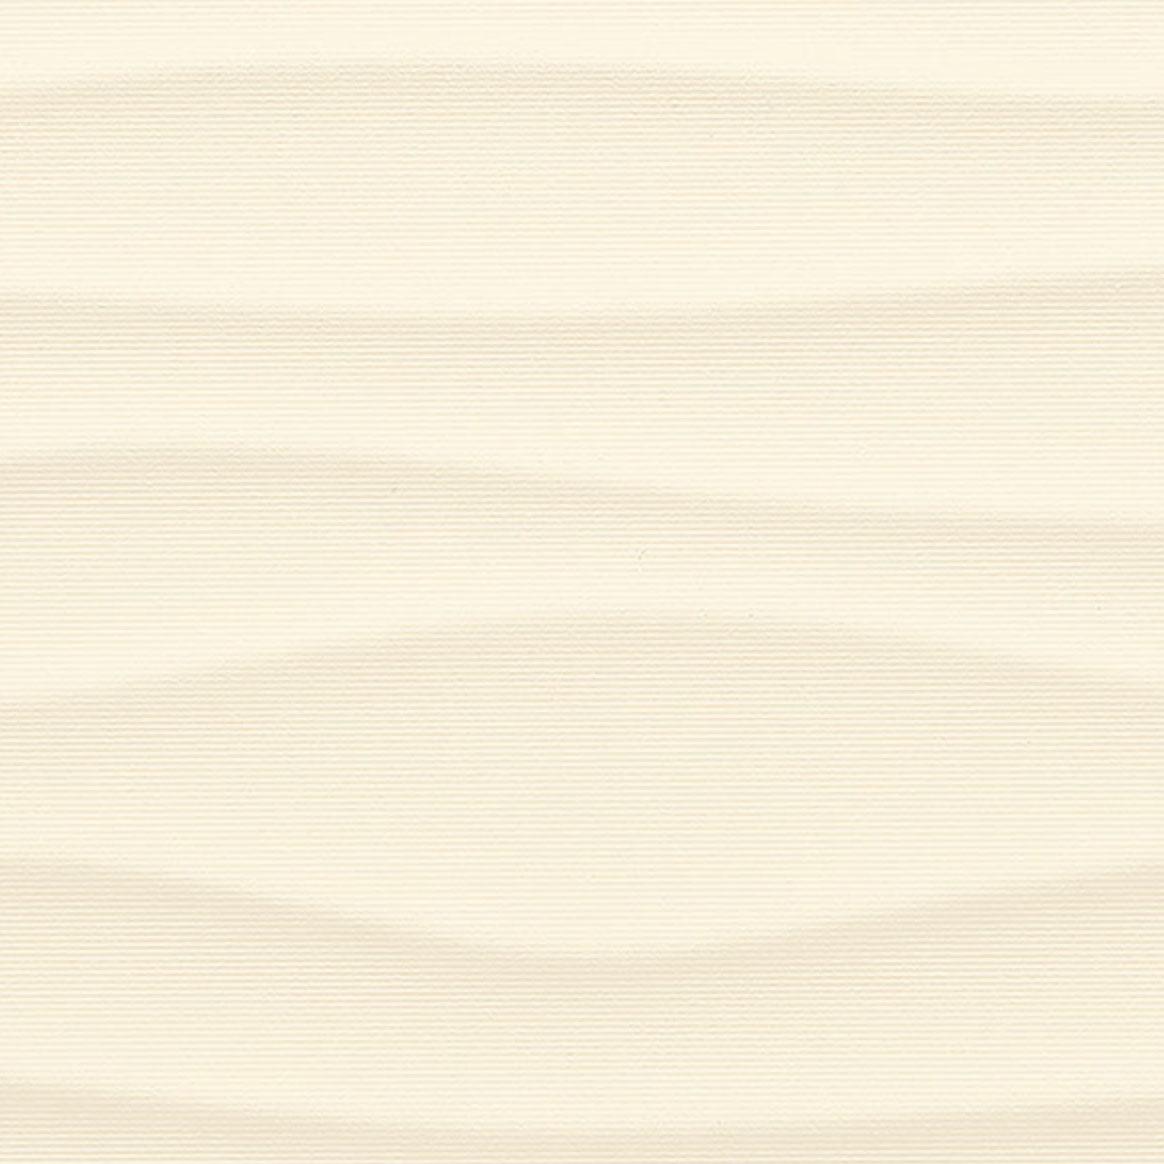 Multitude Modern Khaki Wave